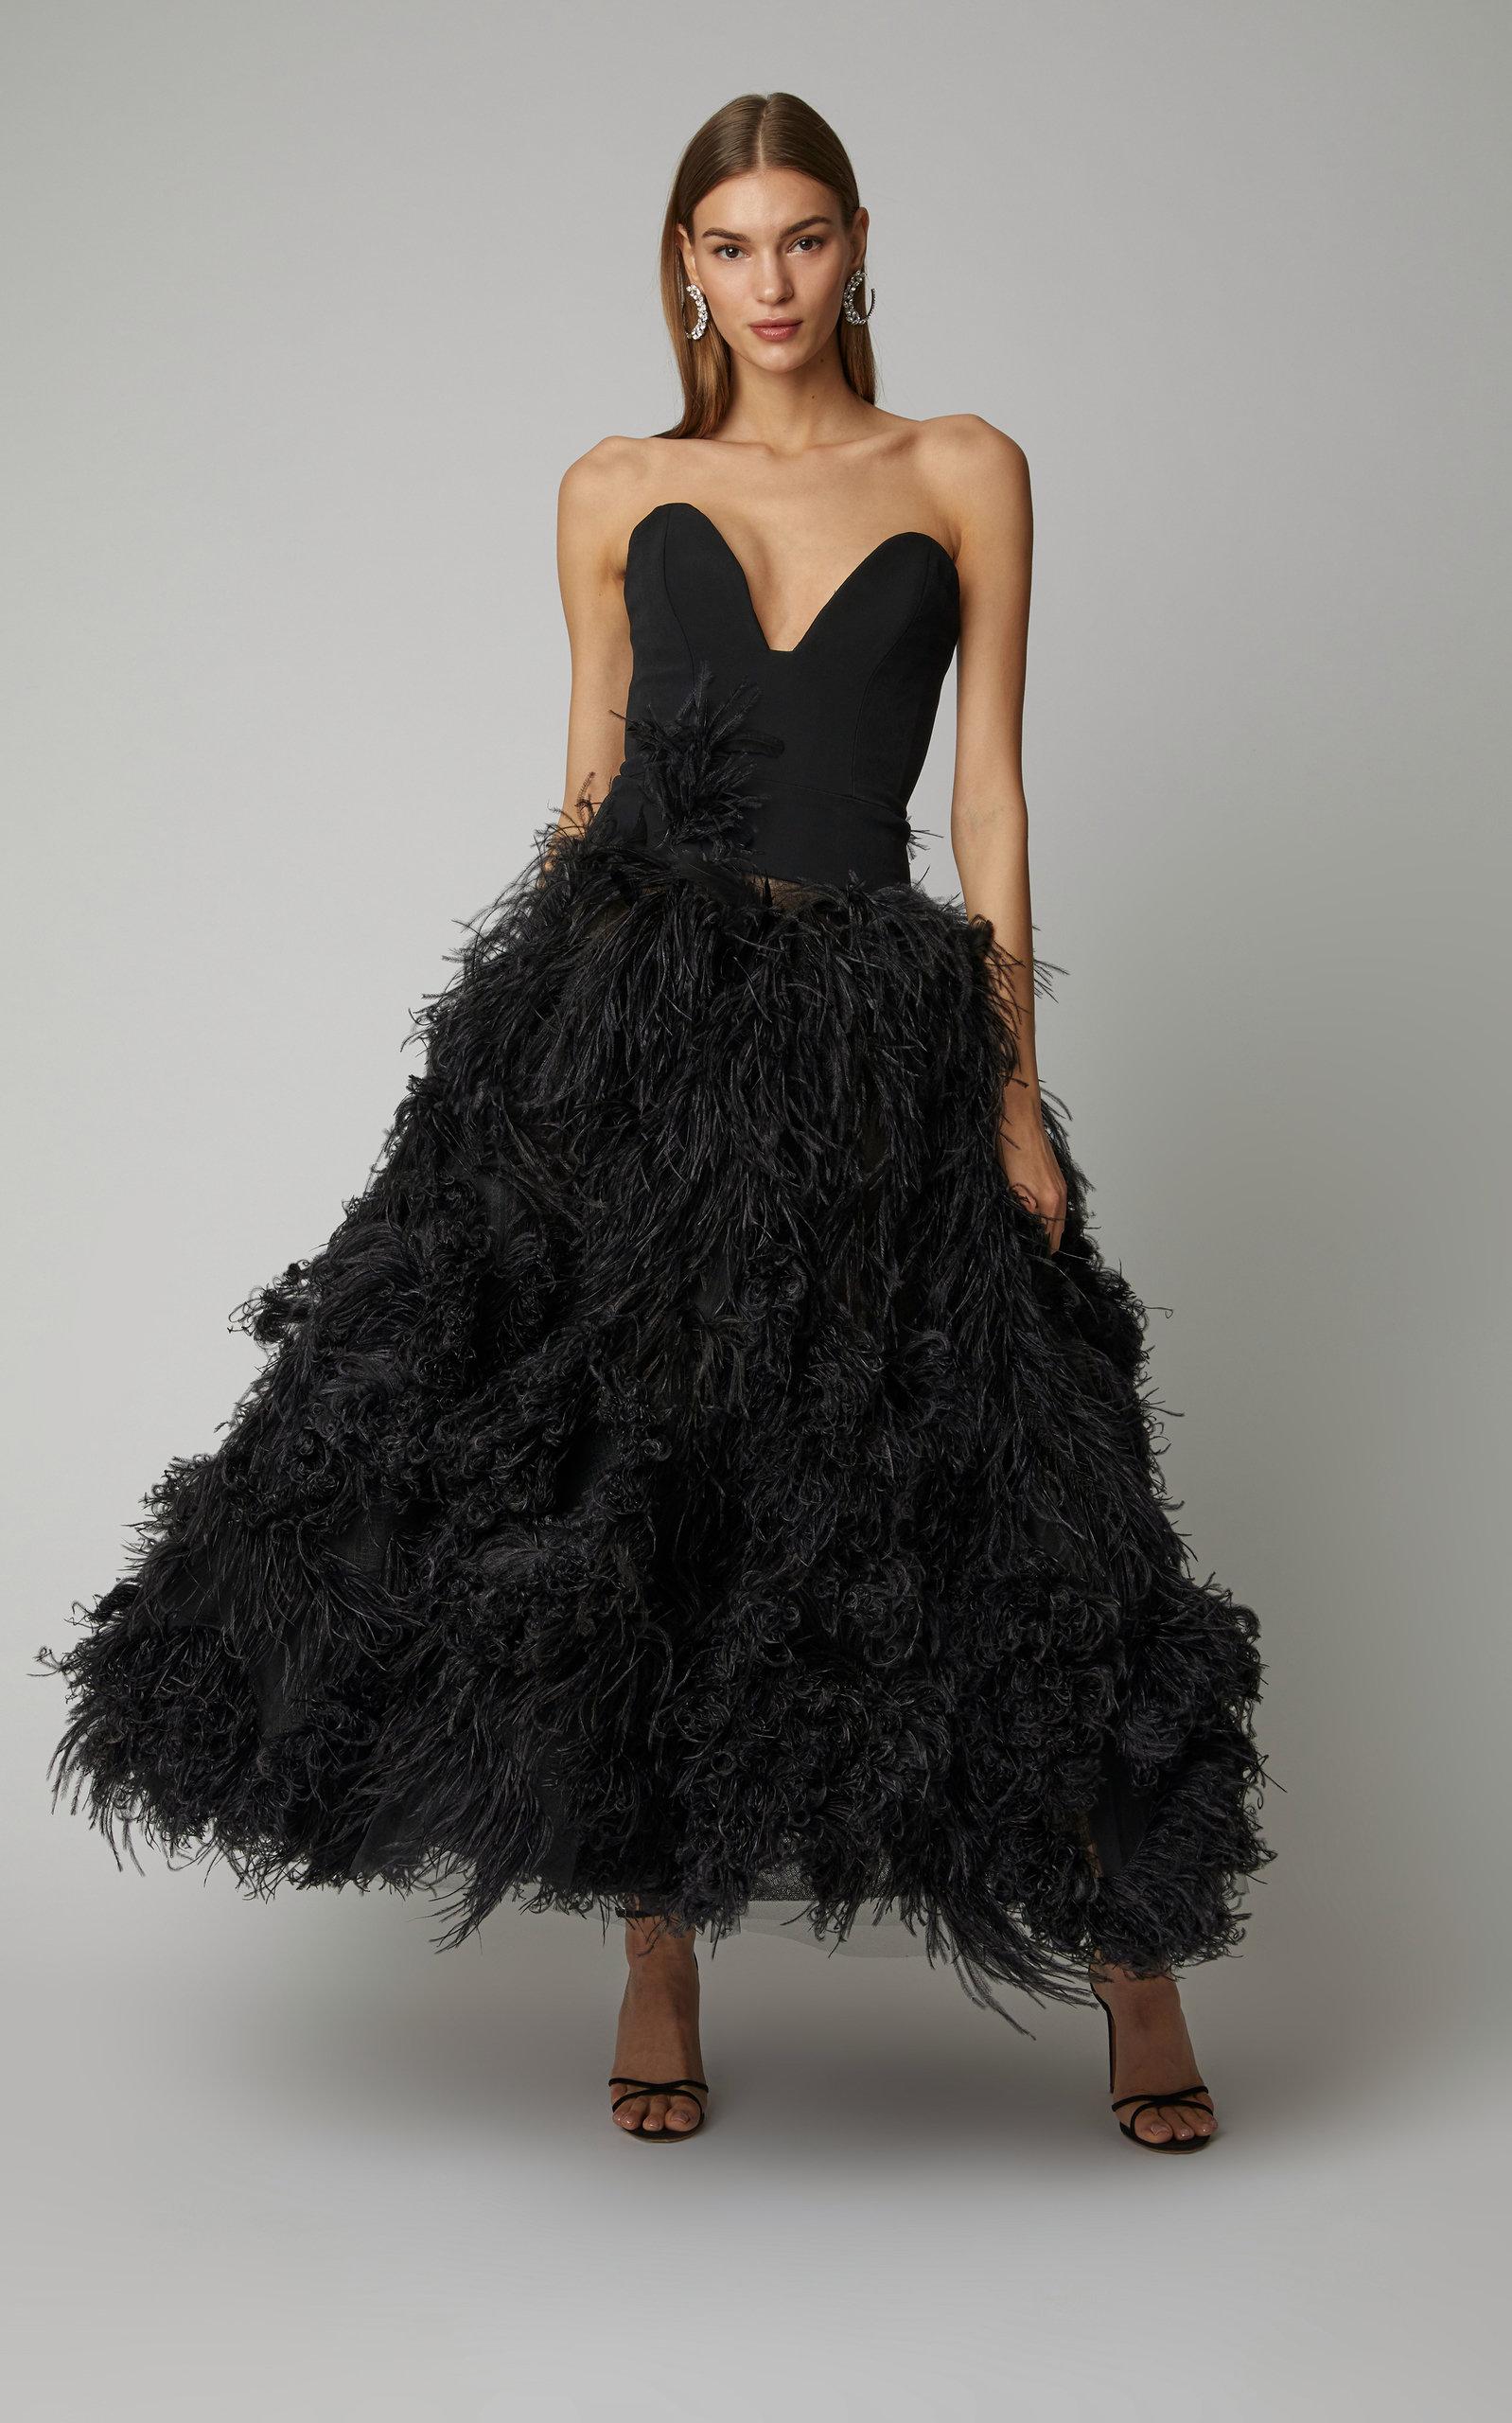 c2fdfd54900c9 Oscar de la RentaStrapless Feather-Embellished Crepe Gown. CLOSE. Loading